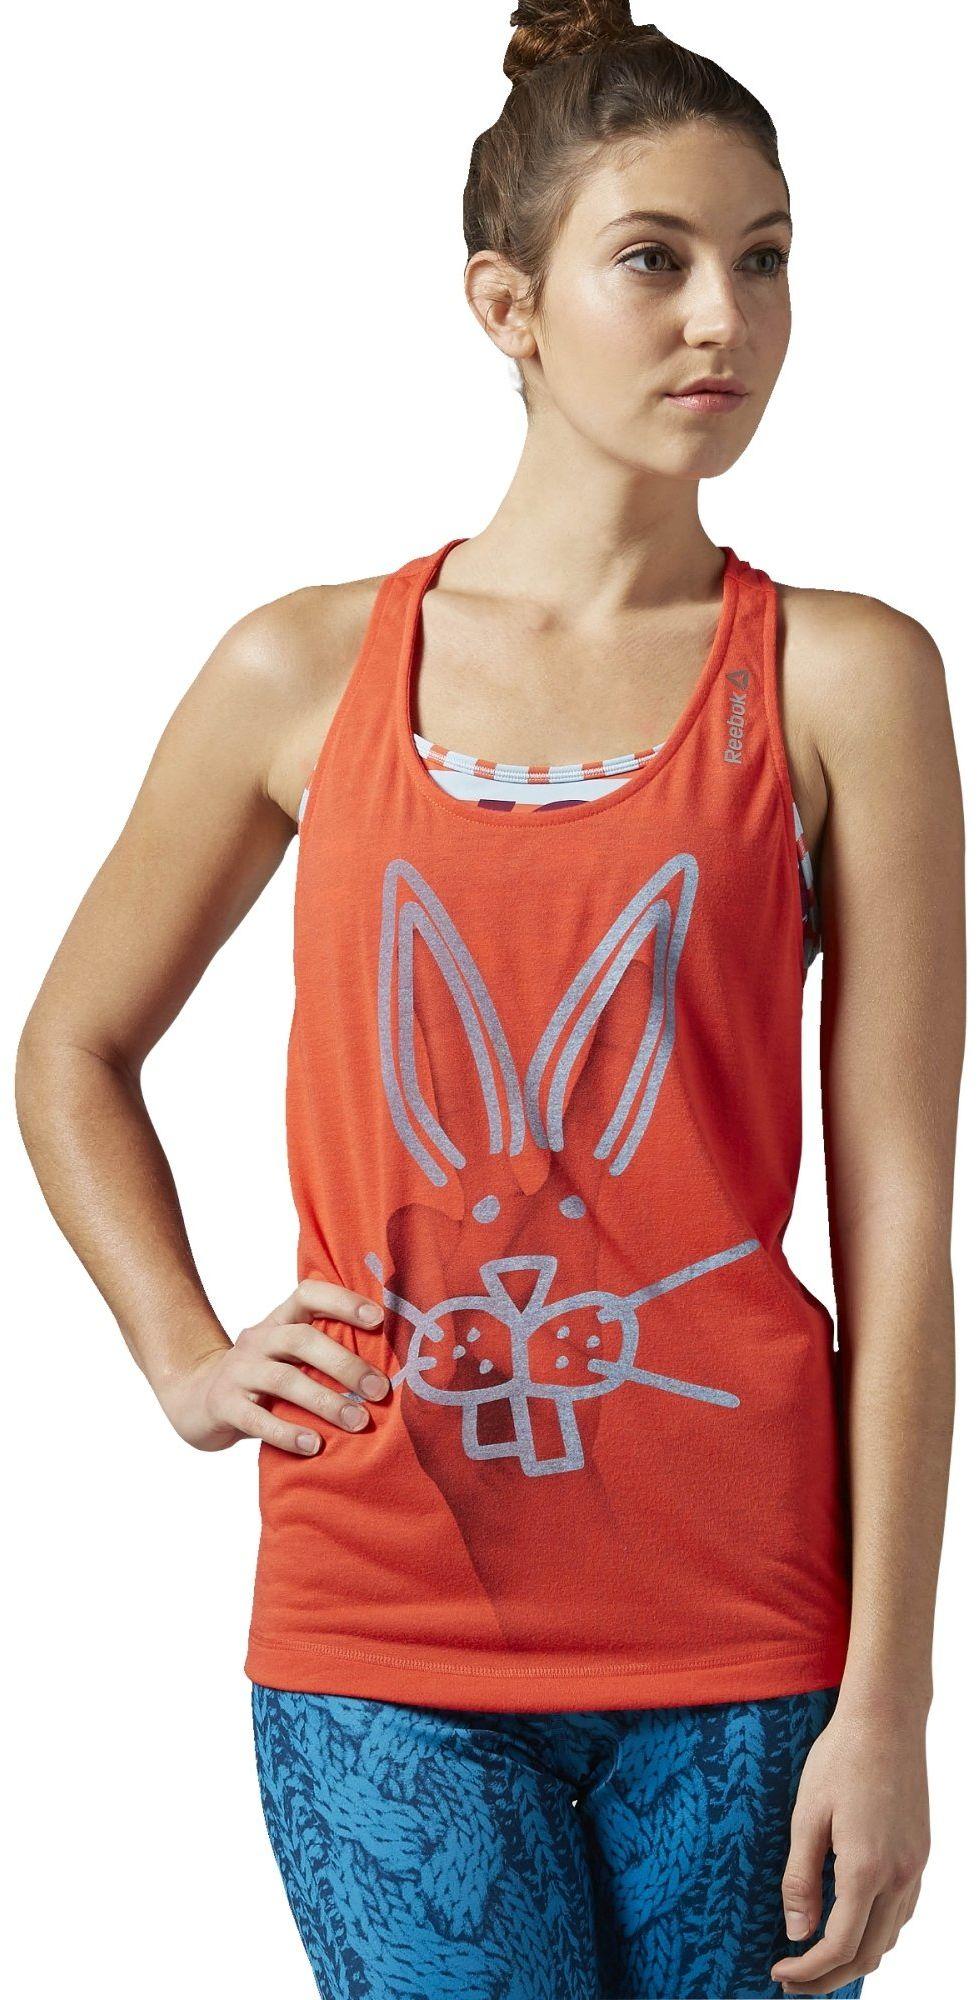 Reebok Damska koszulka bez rękawów Yoga Rabbit Tank, Laser Red, 2XS